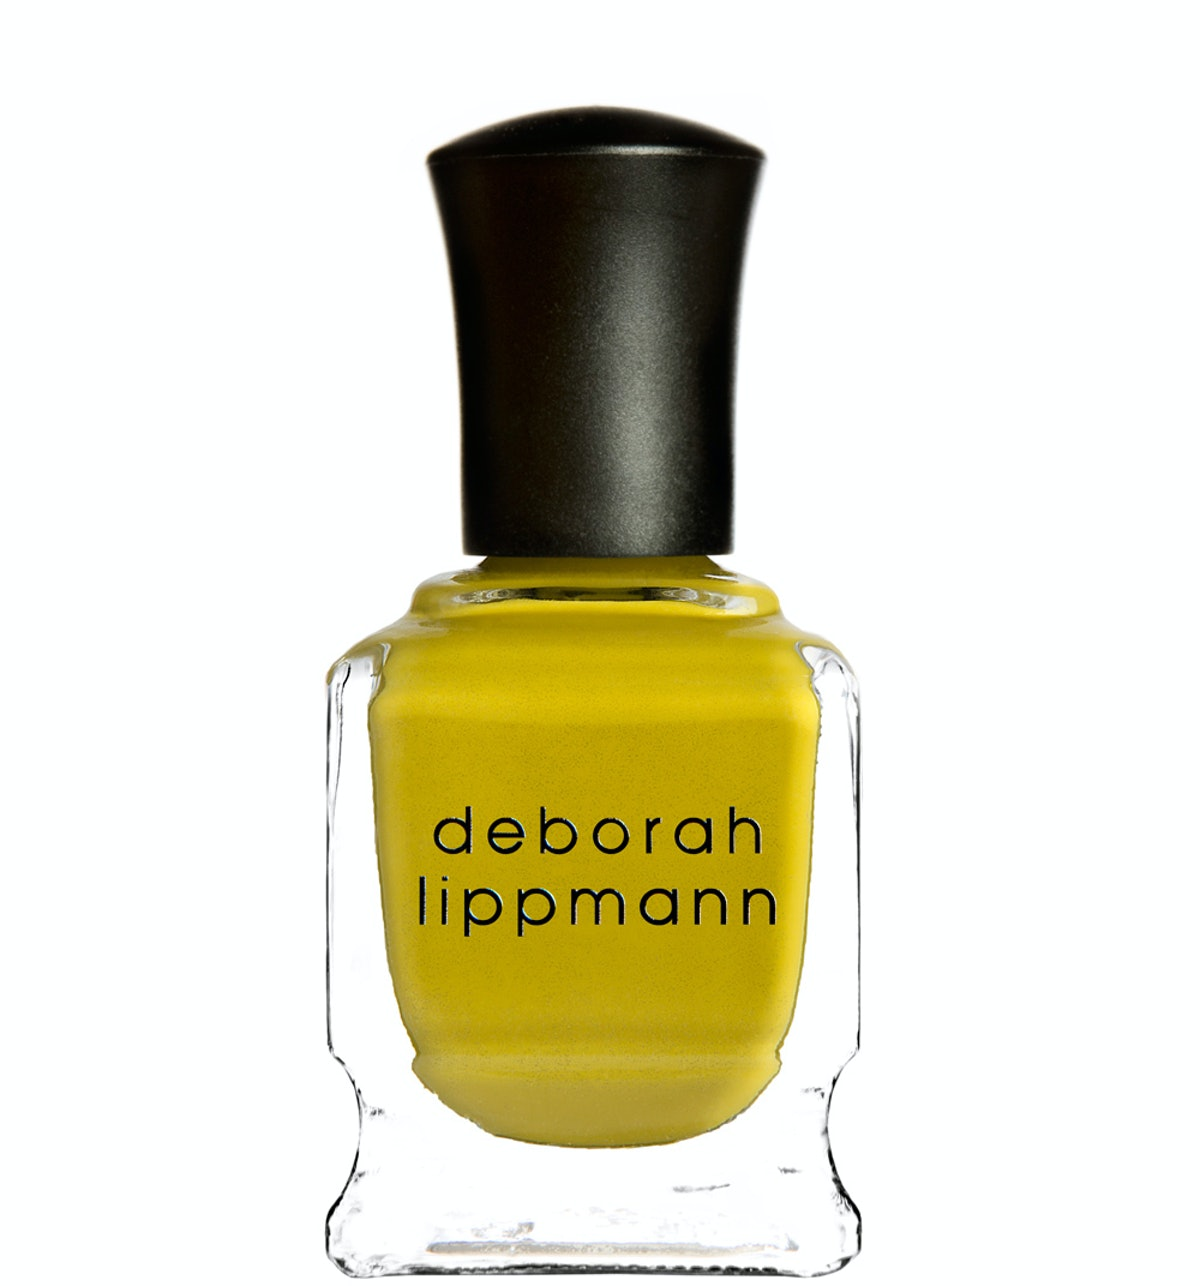 Deborah Lippmann I Wanna Be Sedated